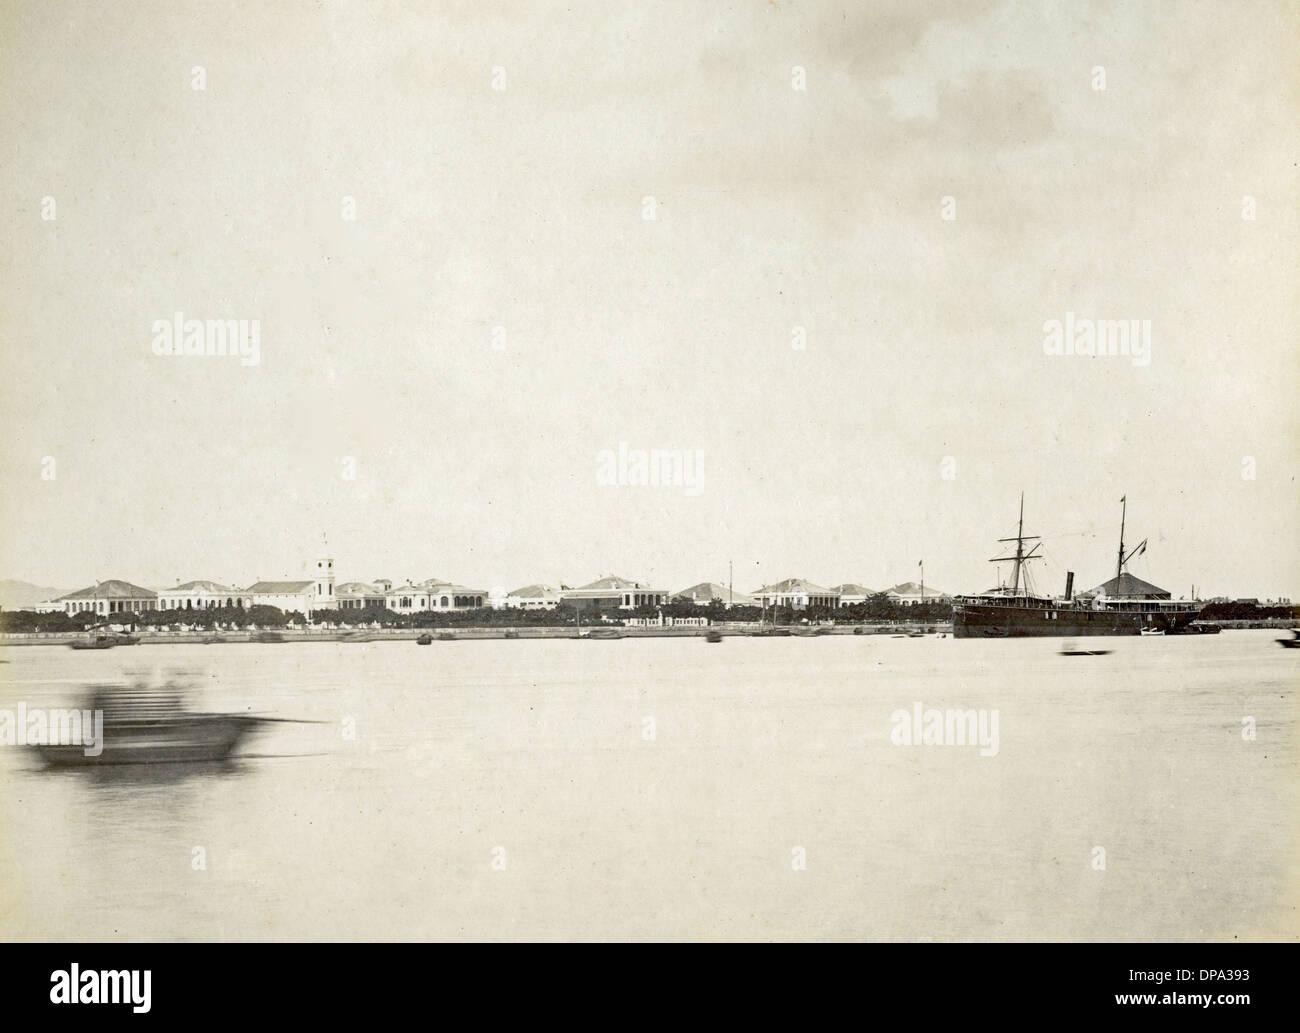 Canton - Floyd Photograph - Stock Image